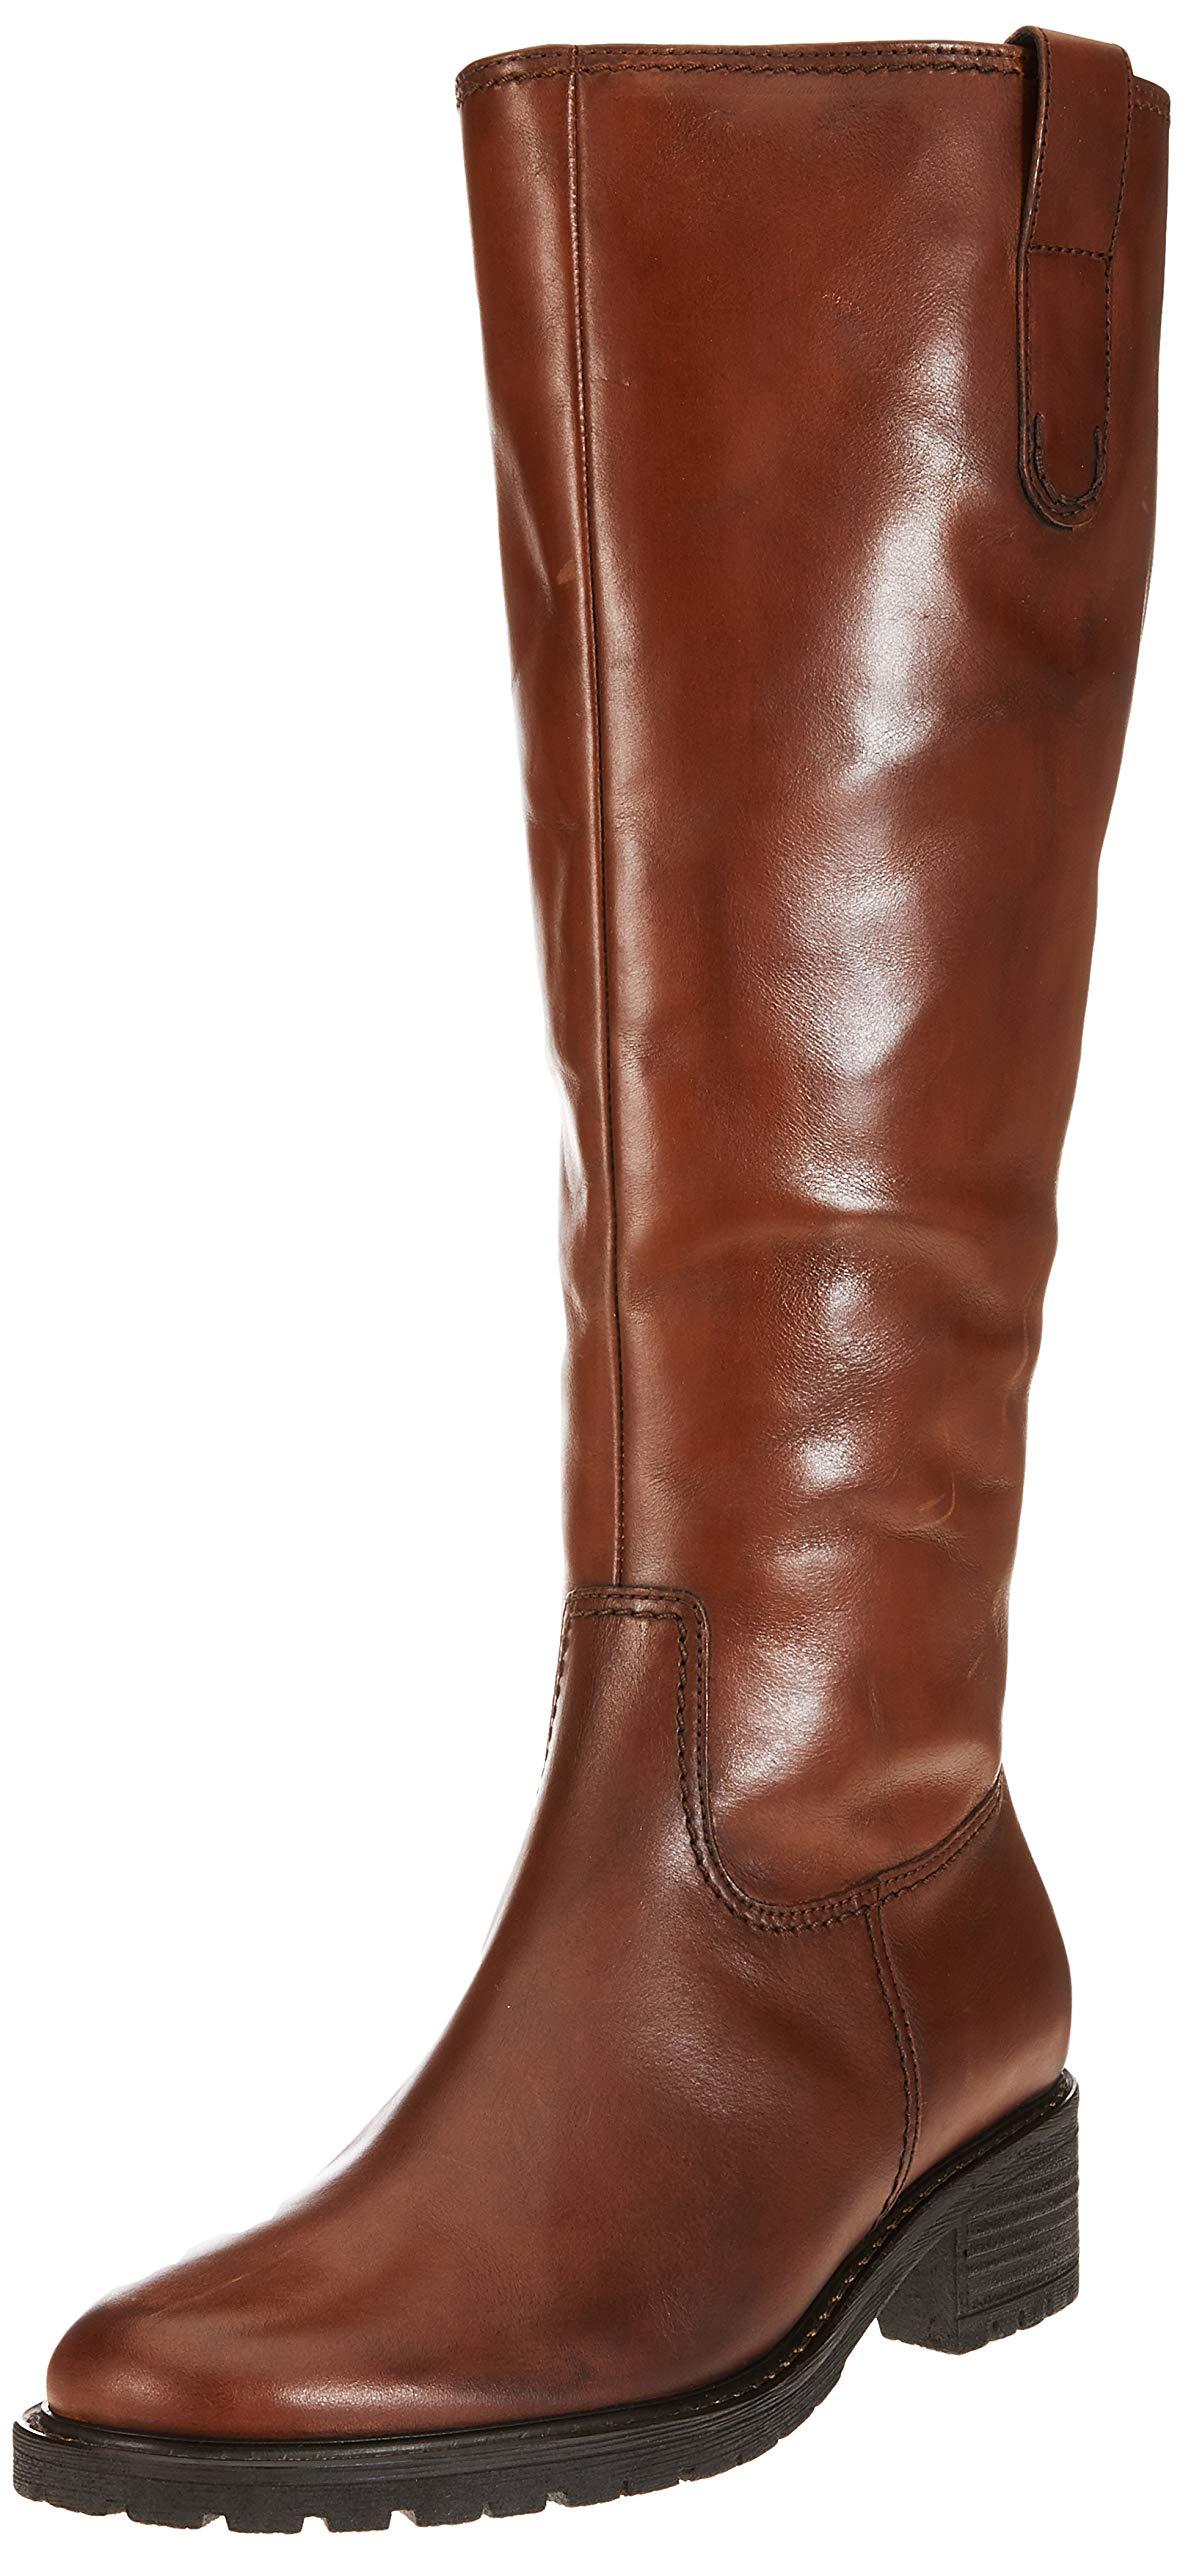 Gabor Hautes Comfort Eu BasicBottes Shoes FemmeMarronwhiskymel5237 y80wmNvnOP